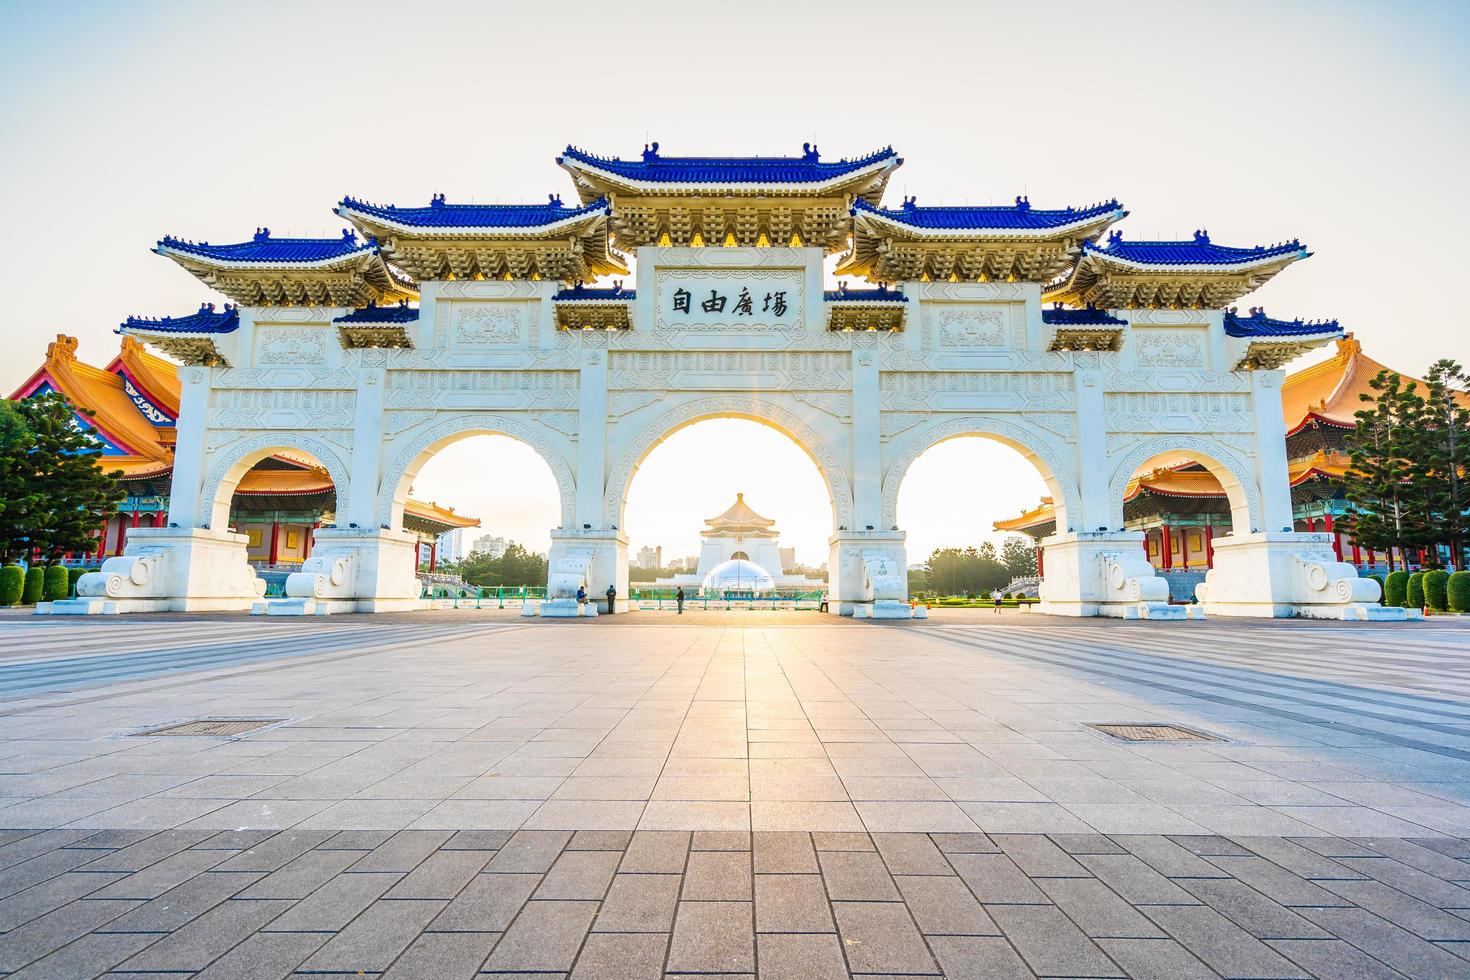 Salle commémorative de chiang kai-shek dans la ville de taipei, taiwan. photo